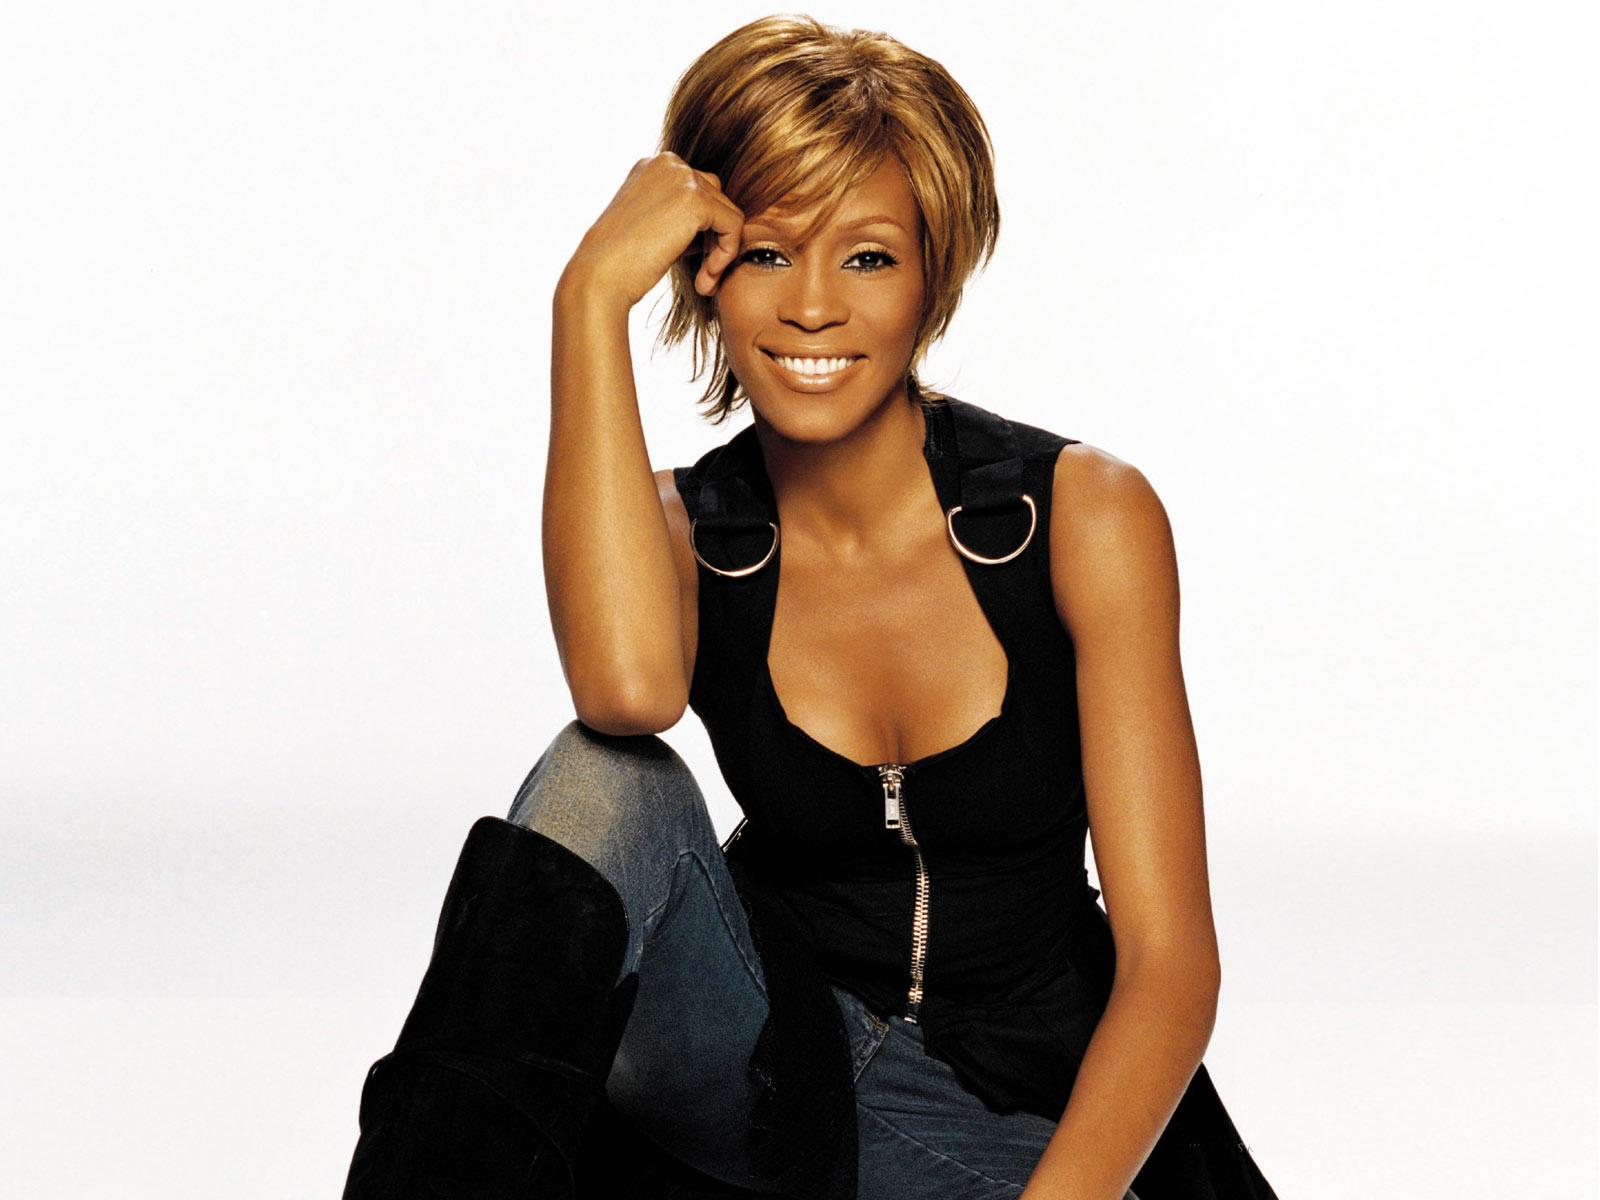 http://1.bp.blogspot.com/-KZCJz0HtwMM/TzkcI7bv5II/AAAAAAAAAqM/lc_rvnh3p3c/s1600/Whitney-Houston-007.jpg